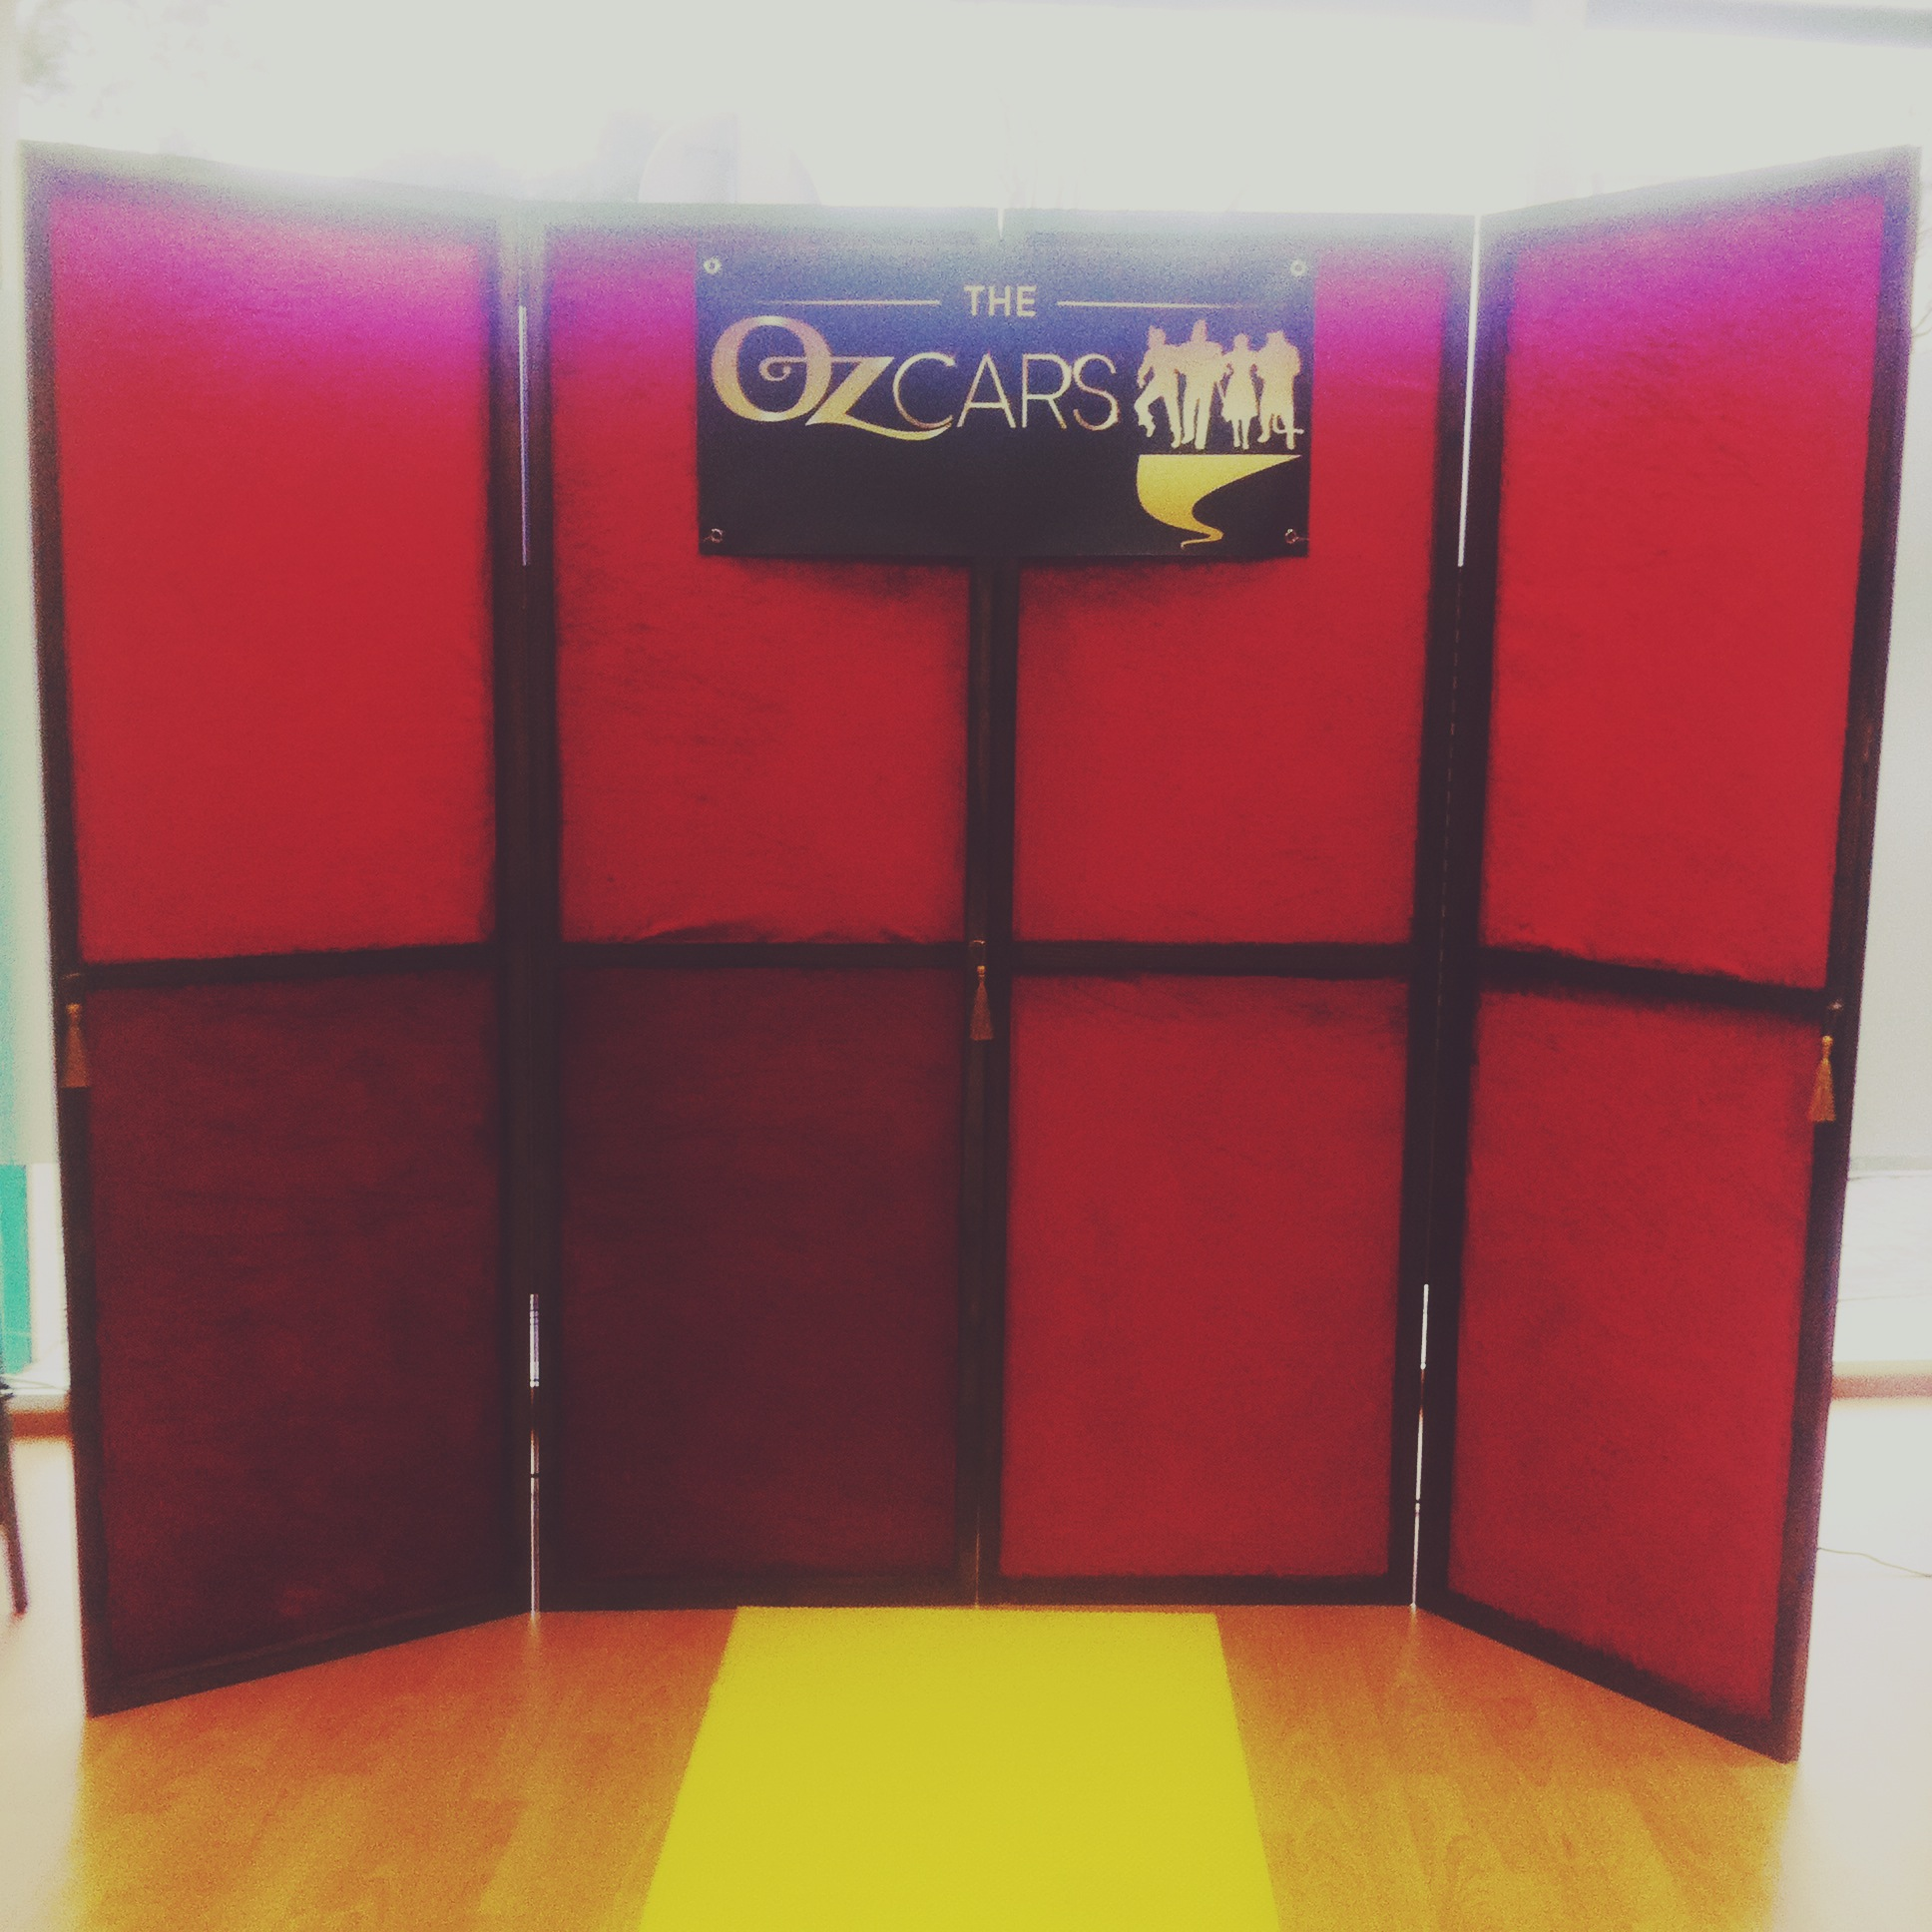 Carnaval-Oz-Ozcars